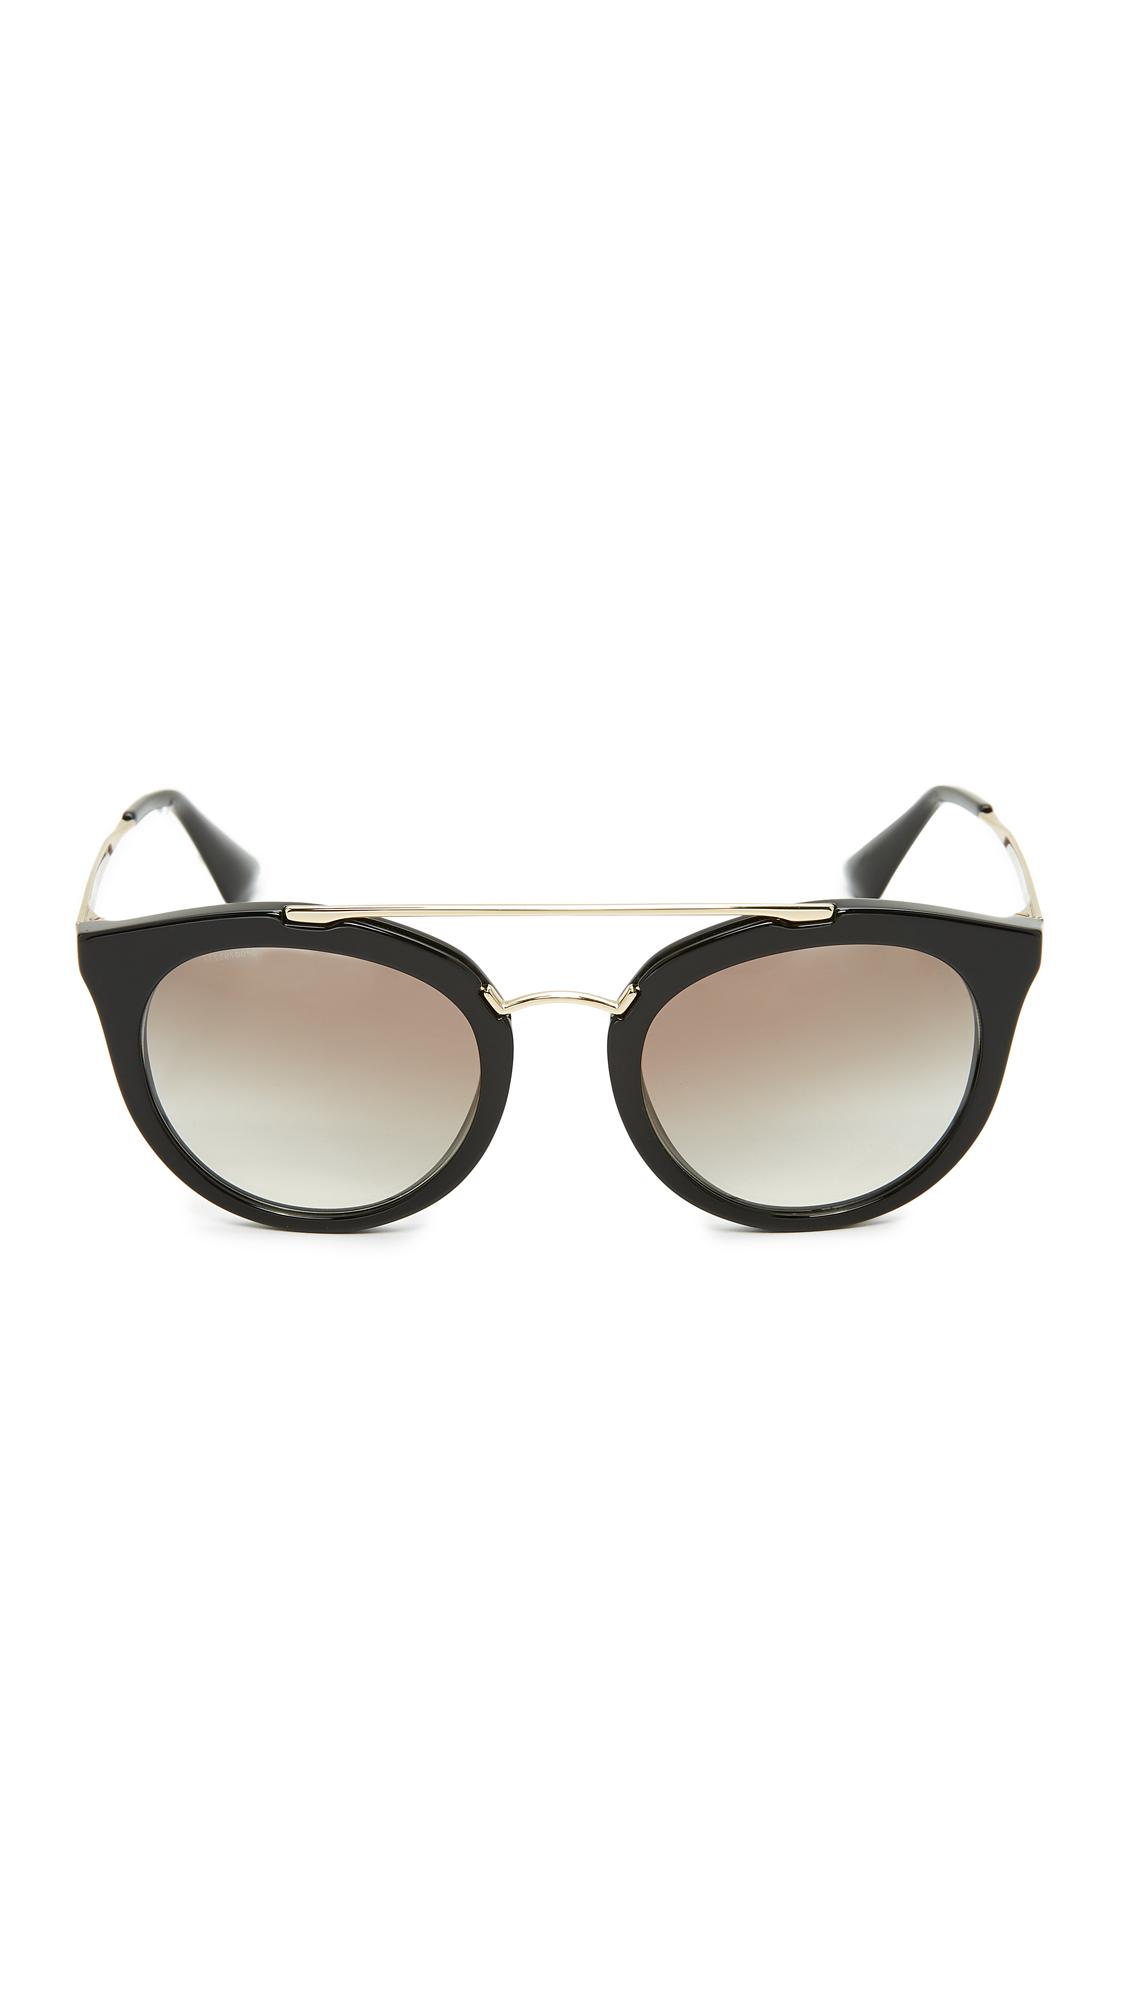 bf5201f8c5b7 ... wholesale prada round aviator sunglasses prada round aviator sunglasses  shopbop save up to 25 use code